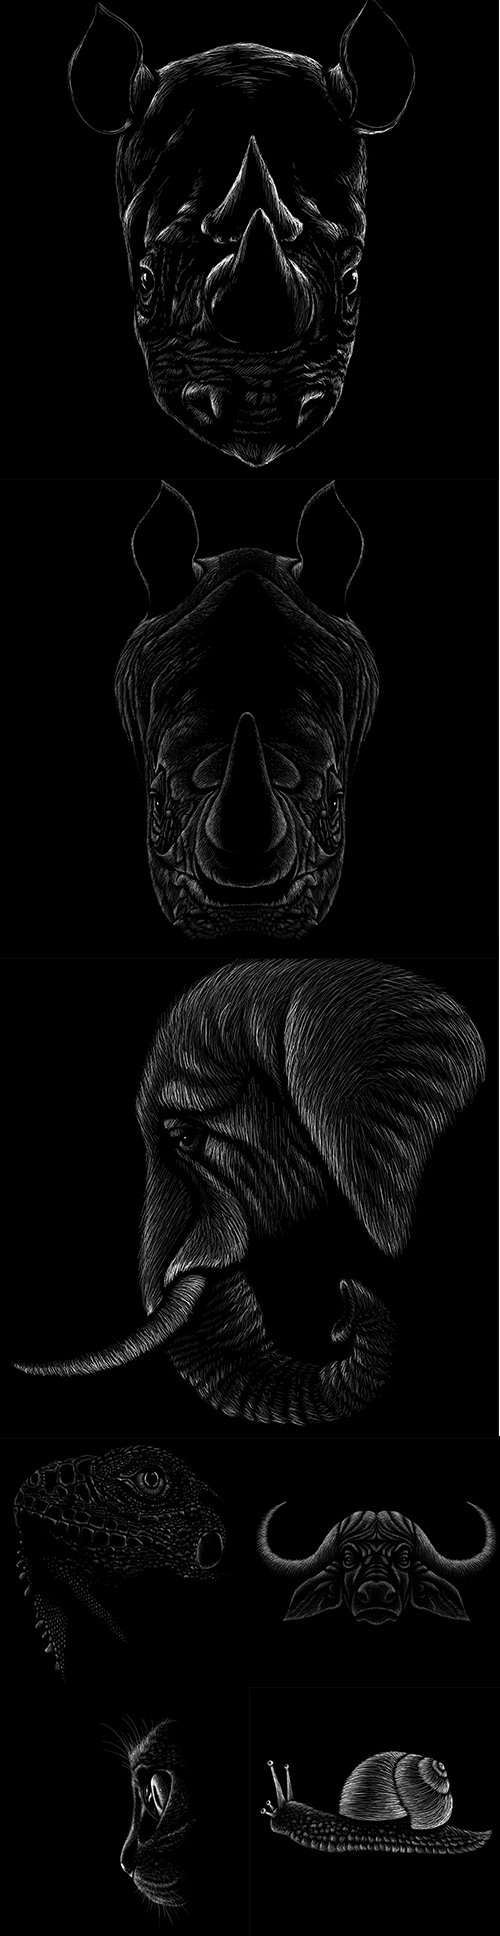 Hand Drawn Animals Premium Vector Set 2